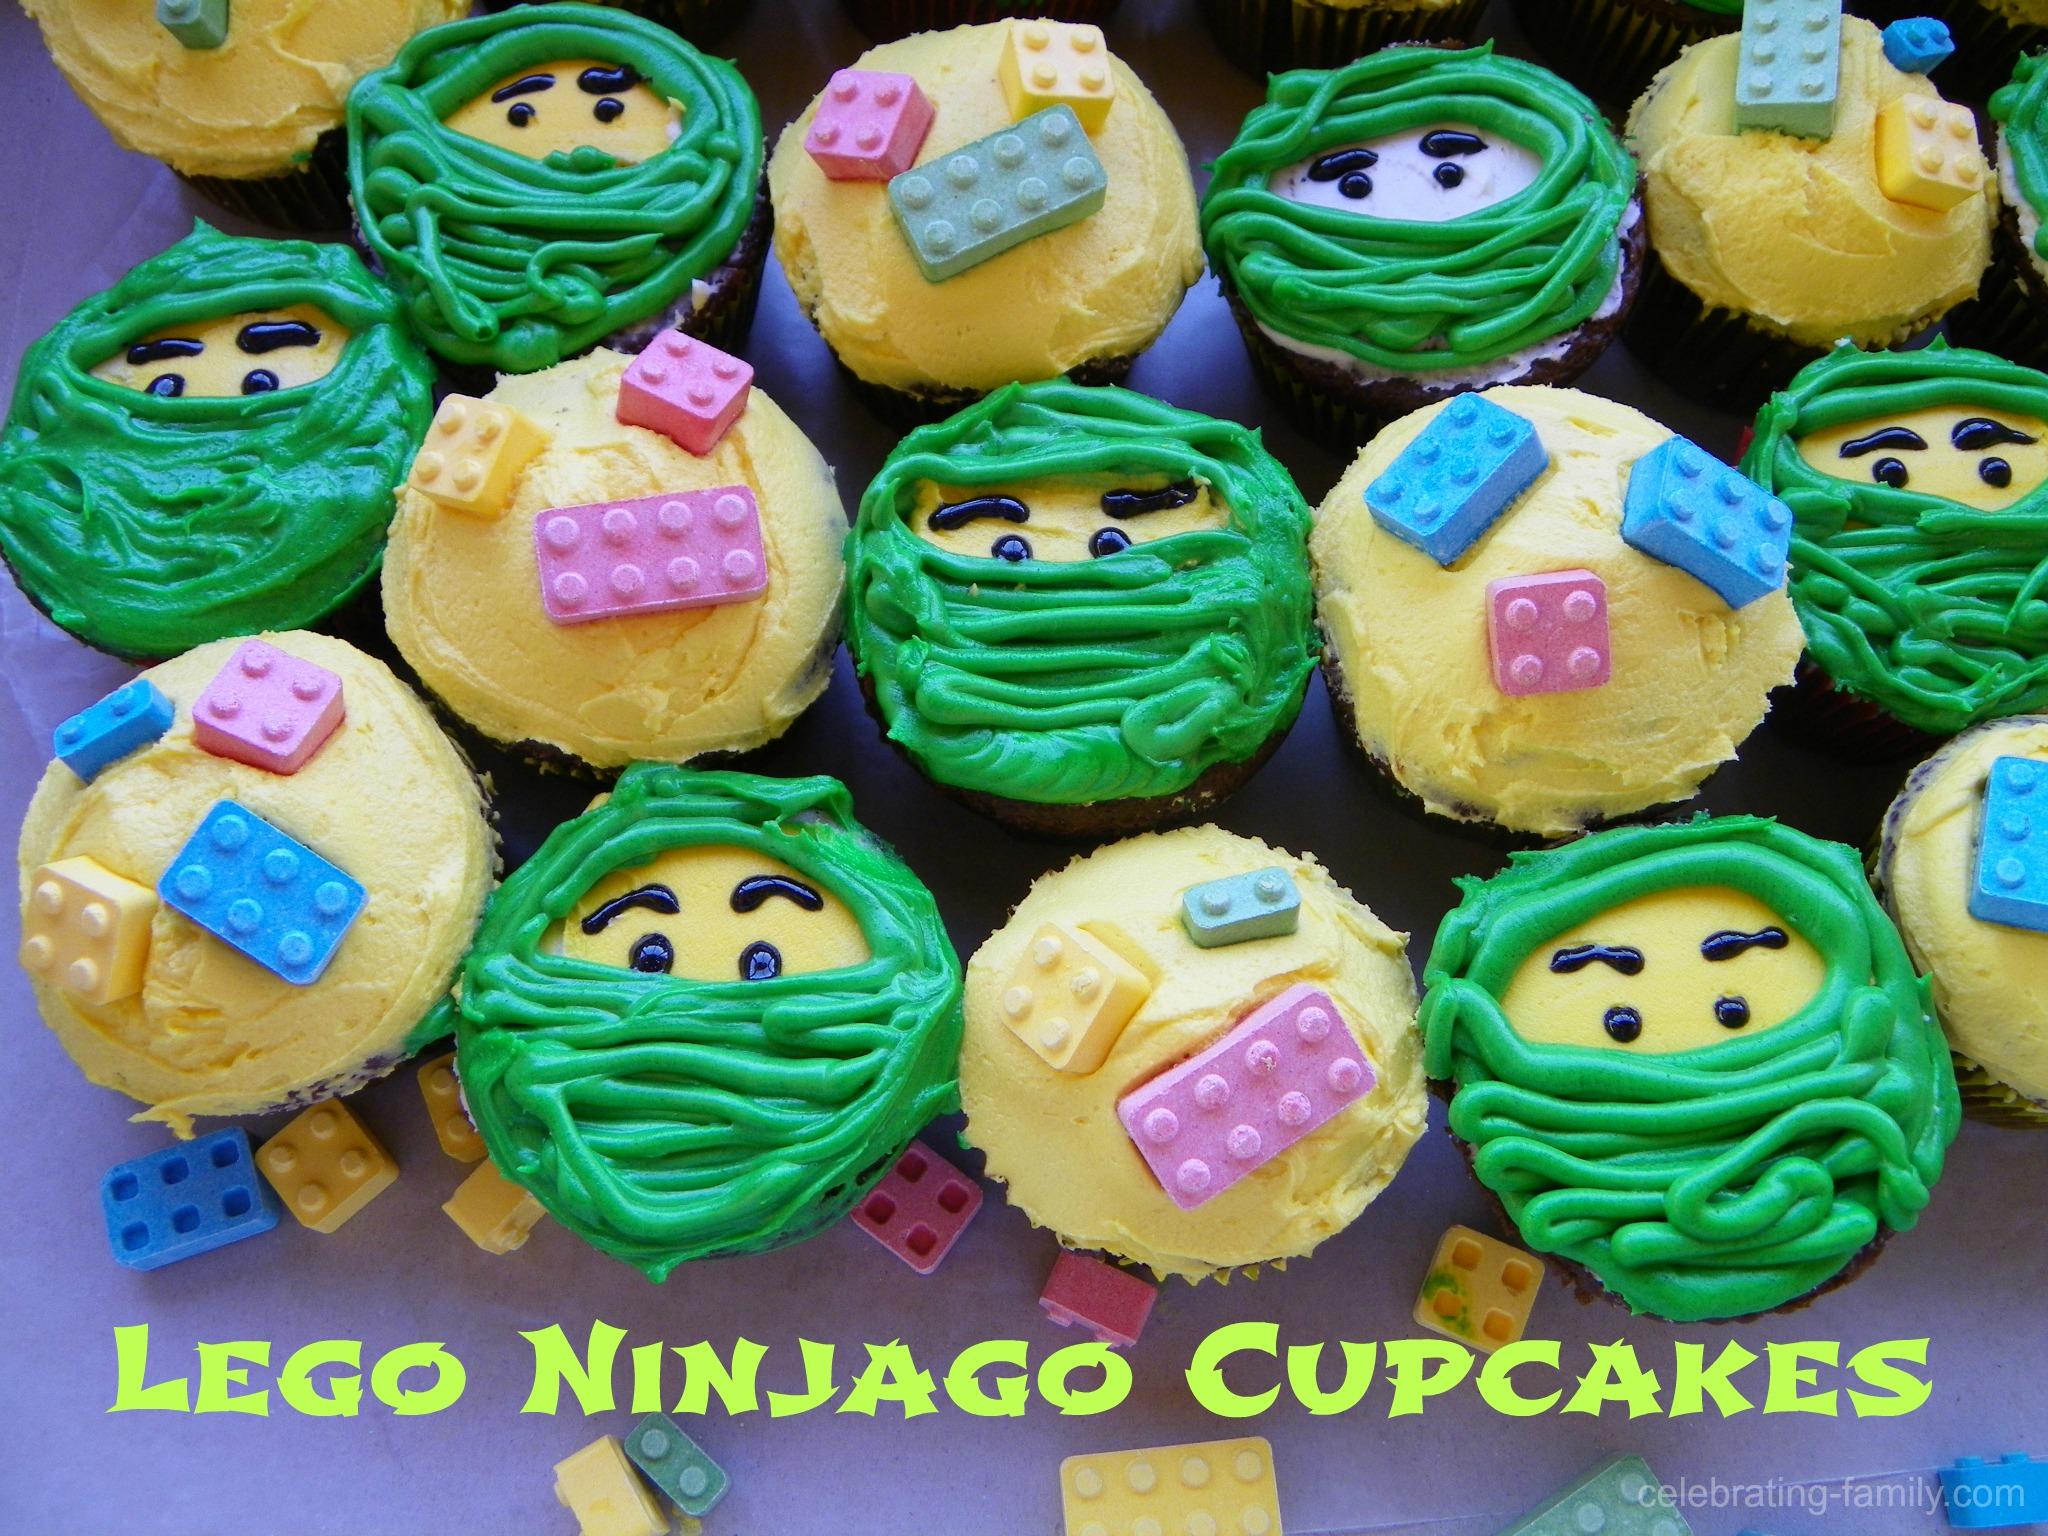 Lego Ninjago Cupcakes with ninja faces and legos